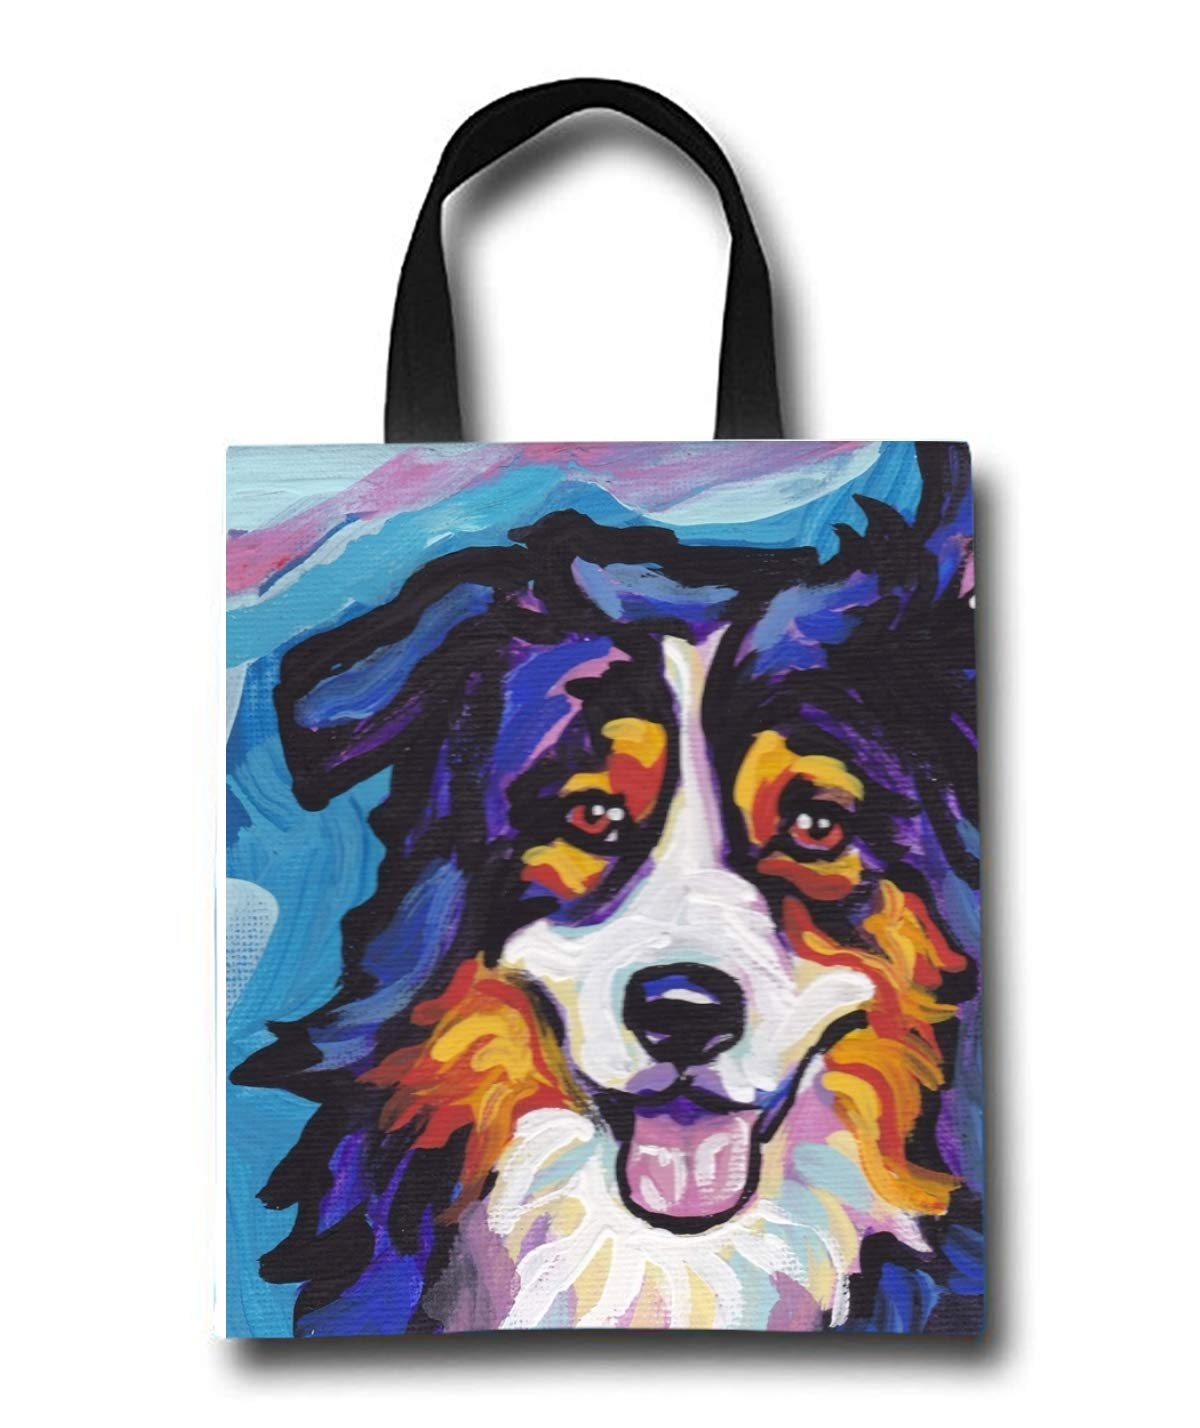 Australian Shepherd Beach Tote Bag - Toy Tote Bag - Large Lightweight Market, Grocery & Picnic